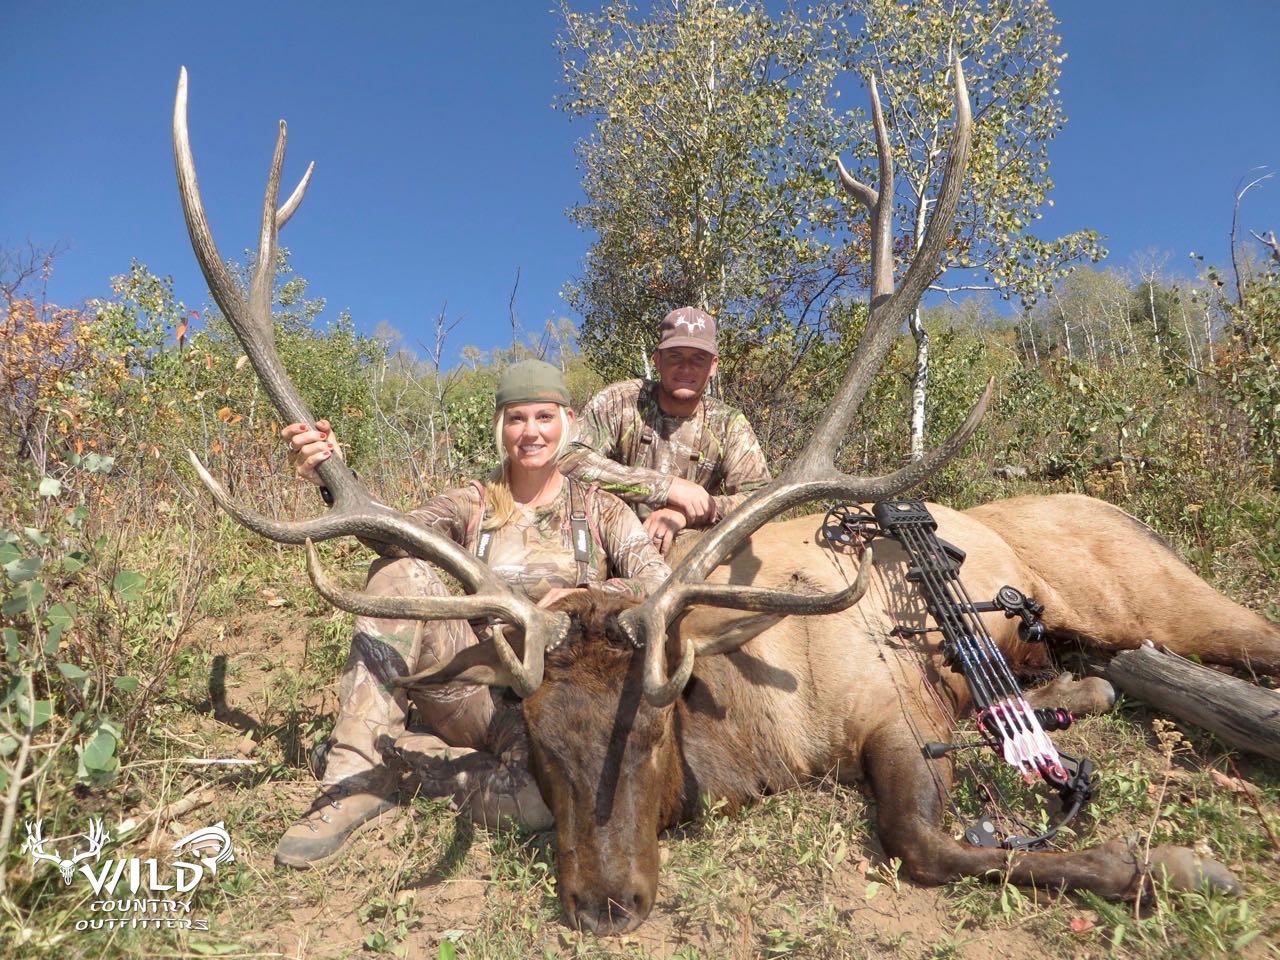 utah archery bull elk hunt tiffany lakosky the crush.jpg